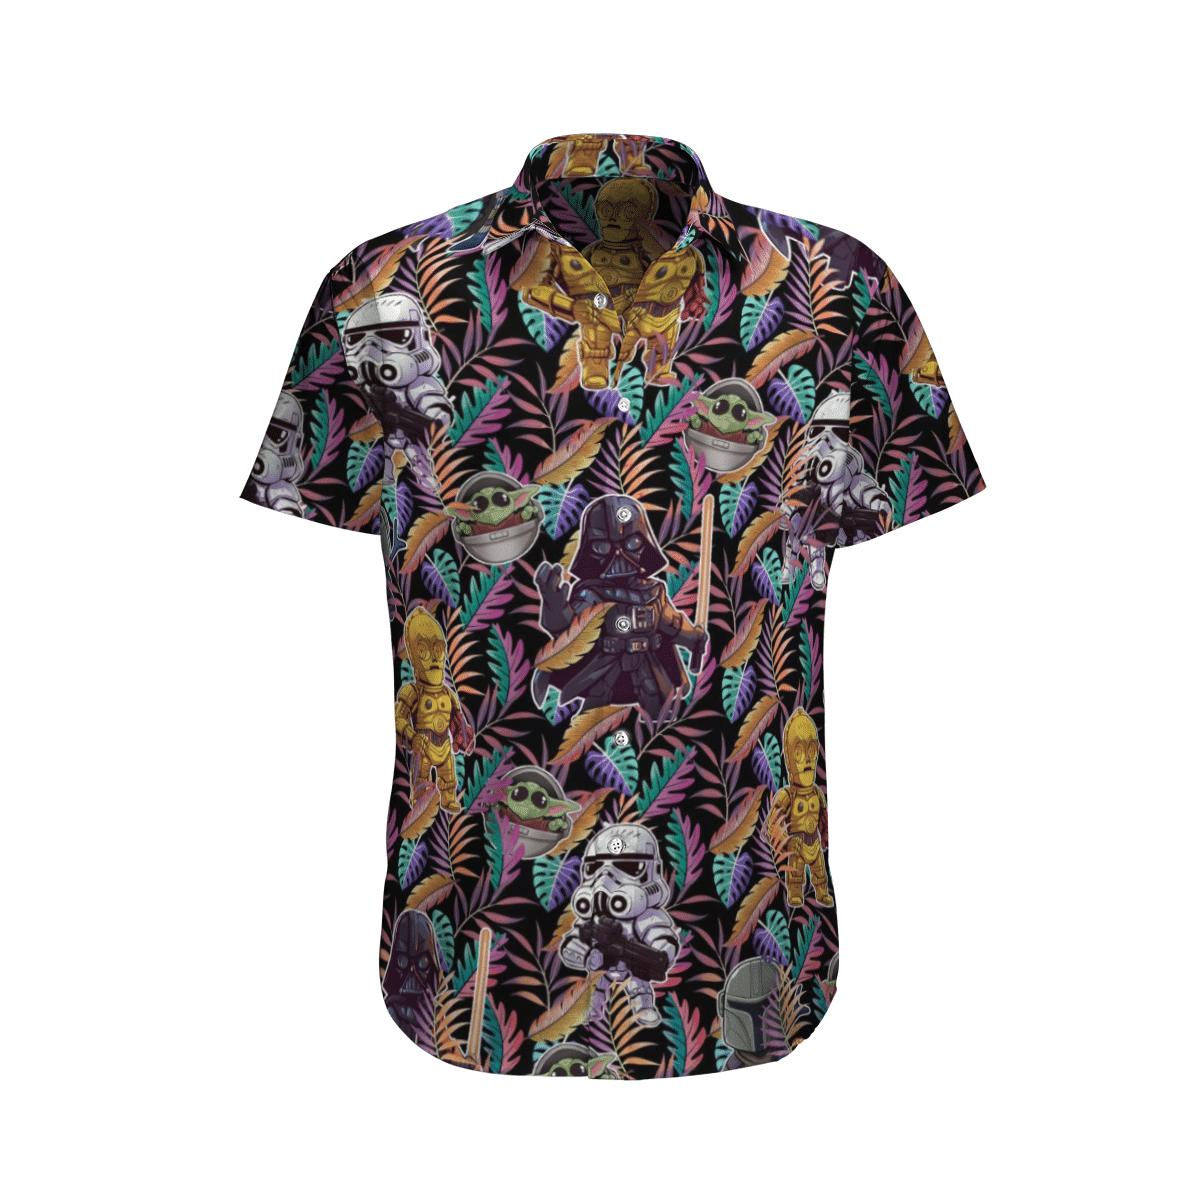 Star wars All characters in paradigm Hawaiian Shirt